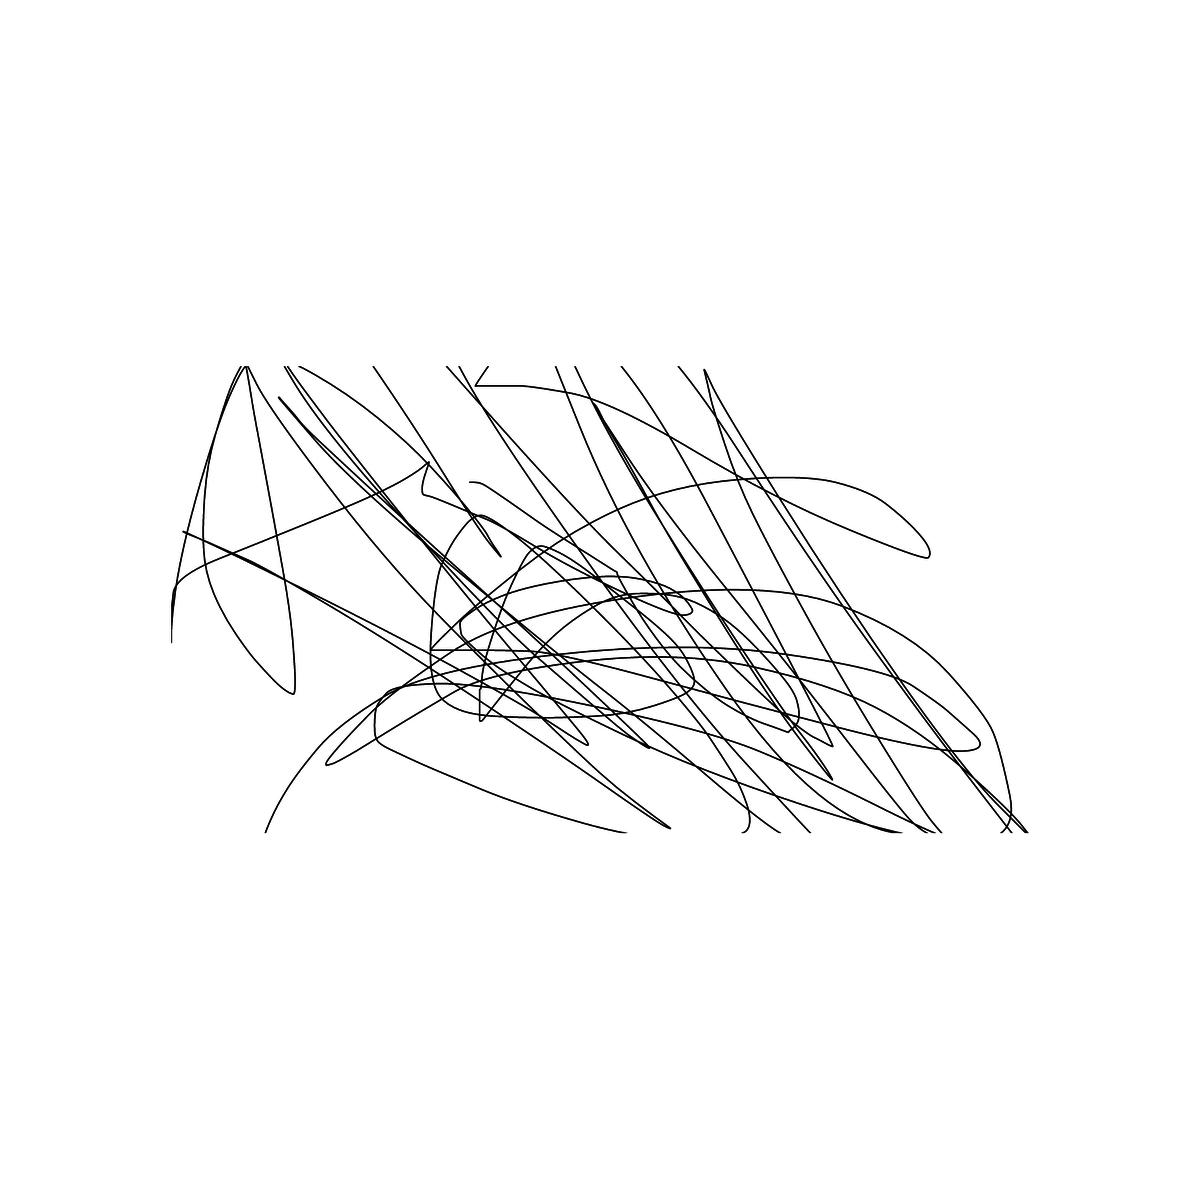 BAAAM drawing#1608 lat:51.4557266235351560lng: -2.1945636272430420